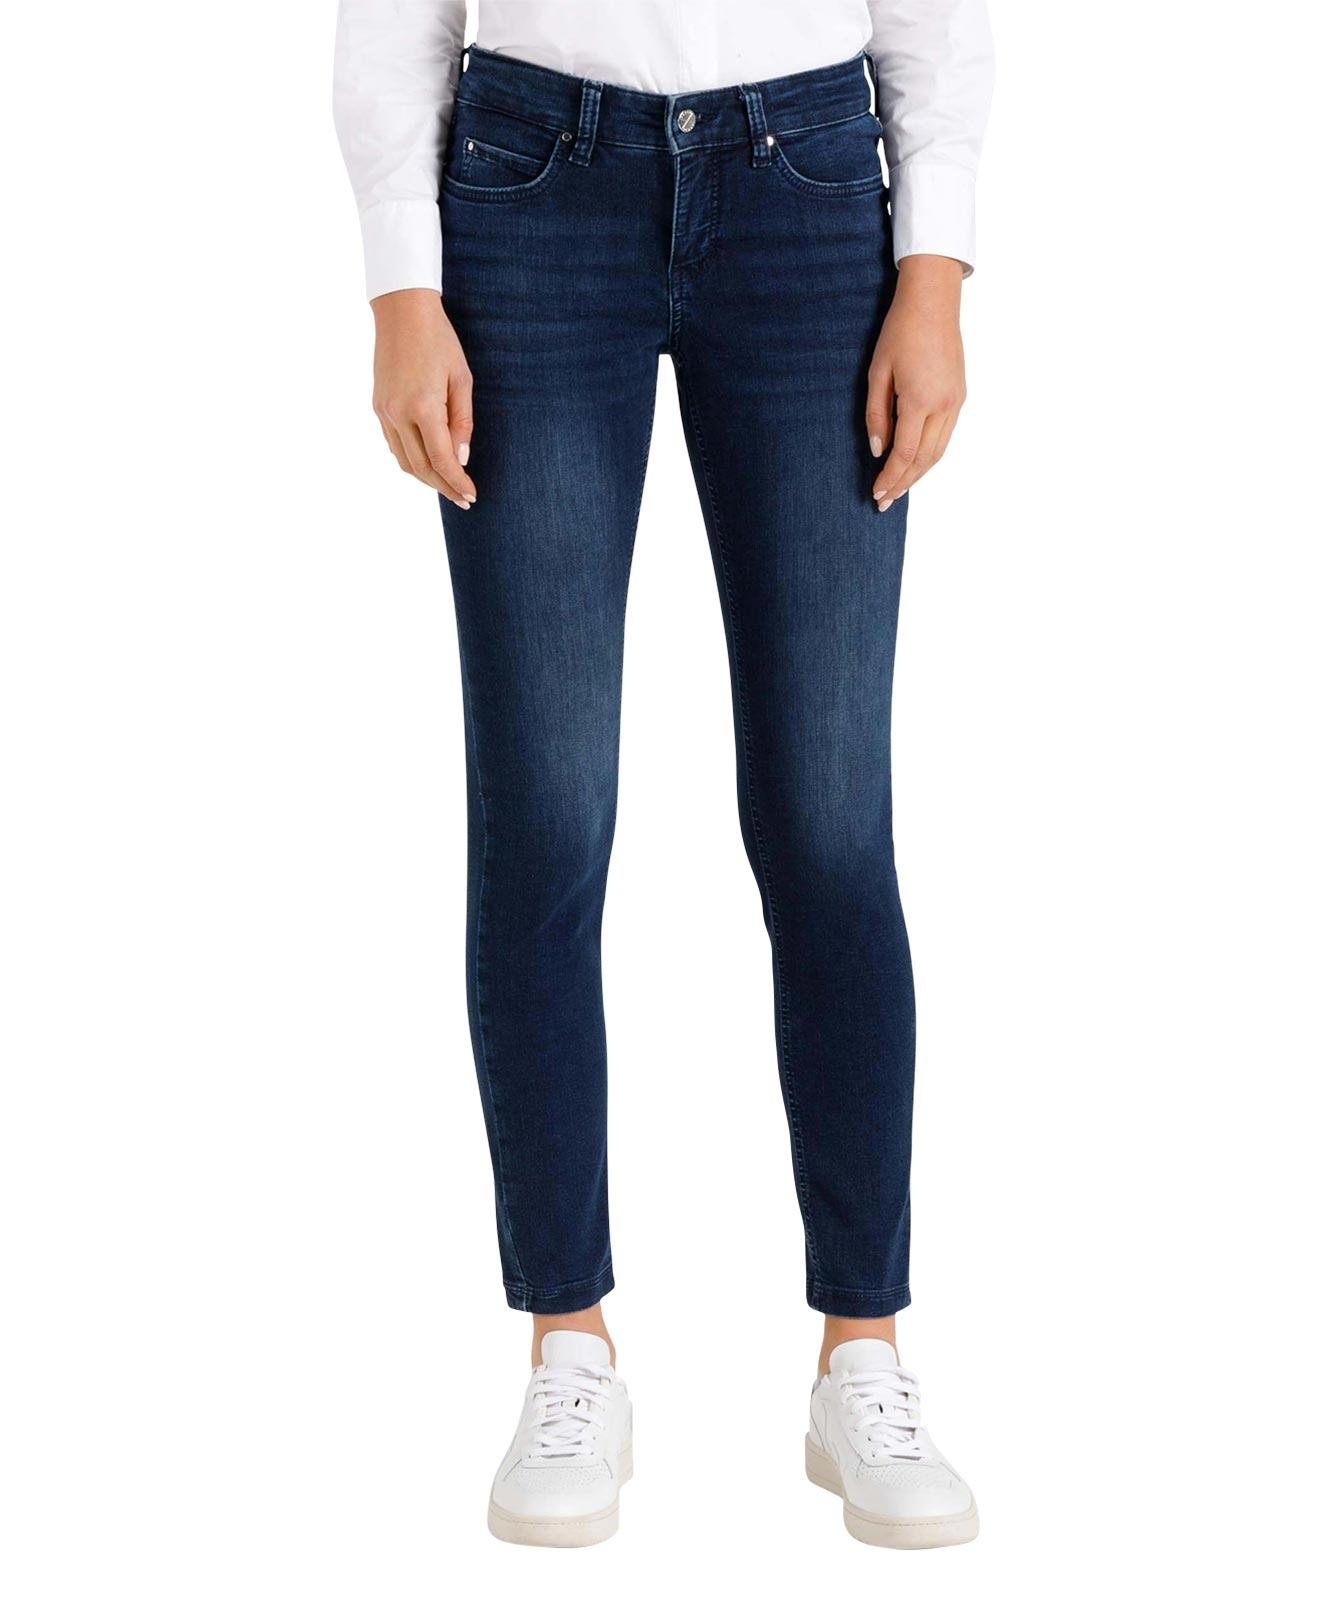 Hosen - MAC Skinny Jeans Dream Skinny Authentic in Basic Slight Used Blue  - Onlineshop Jeans Meile